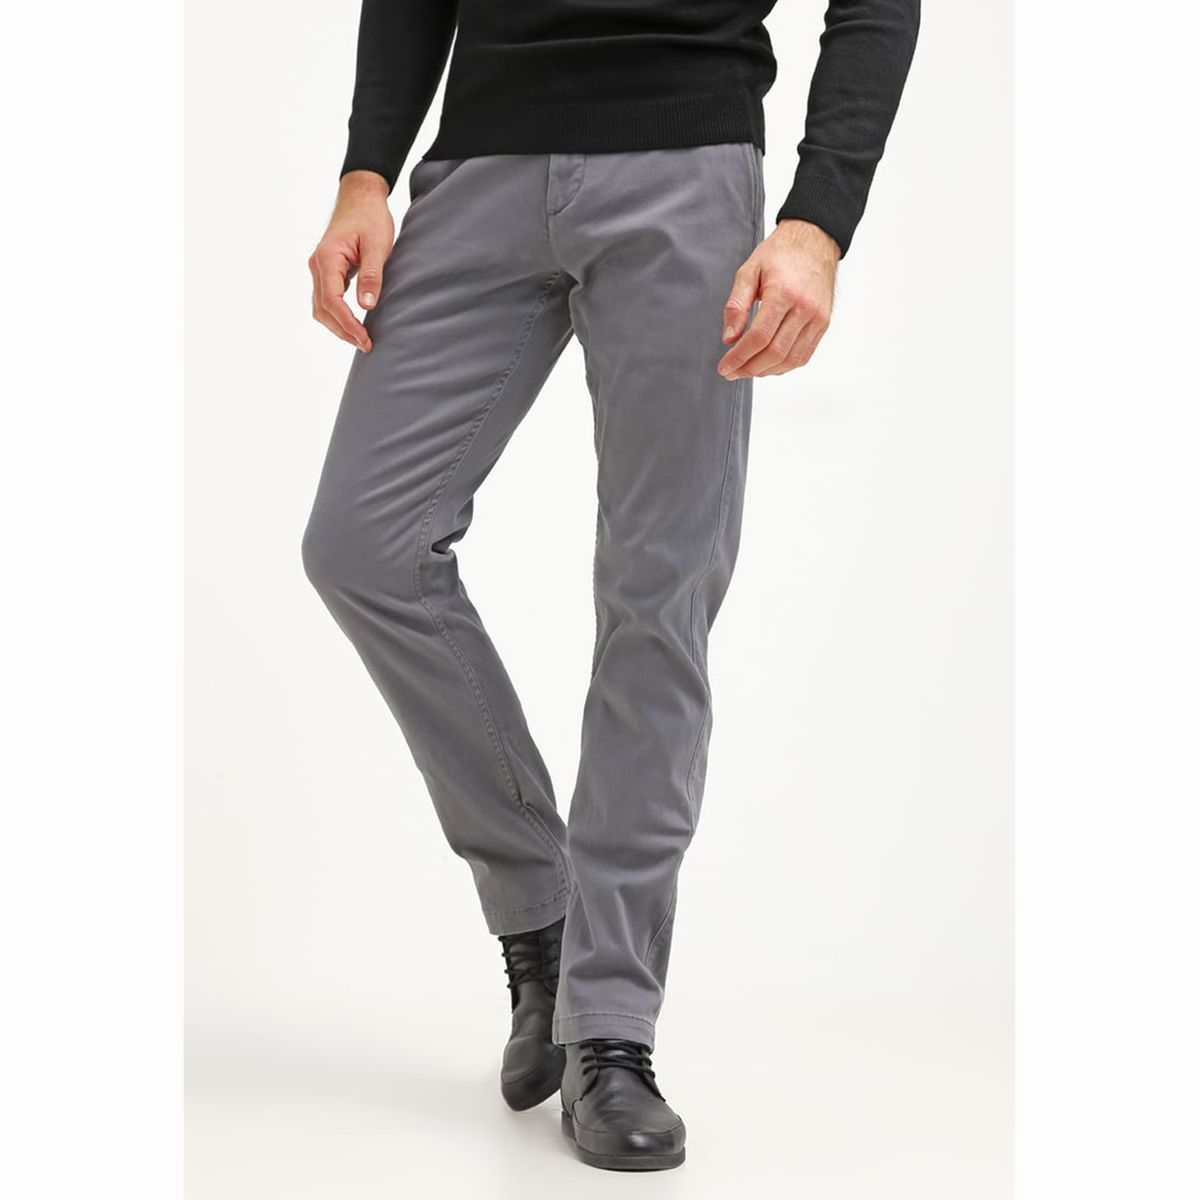 Pantalon Chino Coupe Slim Washed Khaki Stretch Taille W33 L34 W30 L34 Pantalon Chino Vestimentaire Et Style Vestimentaire